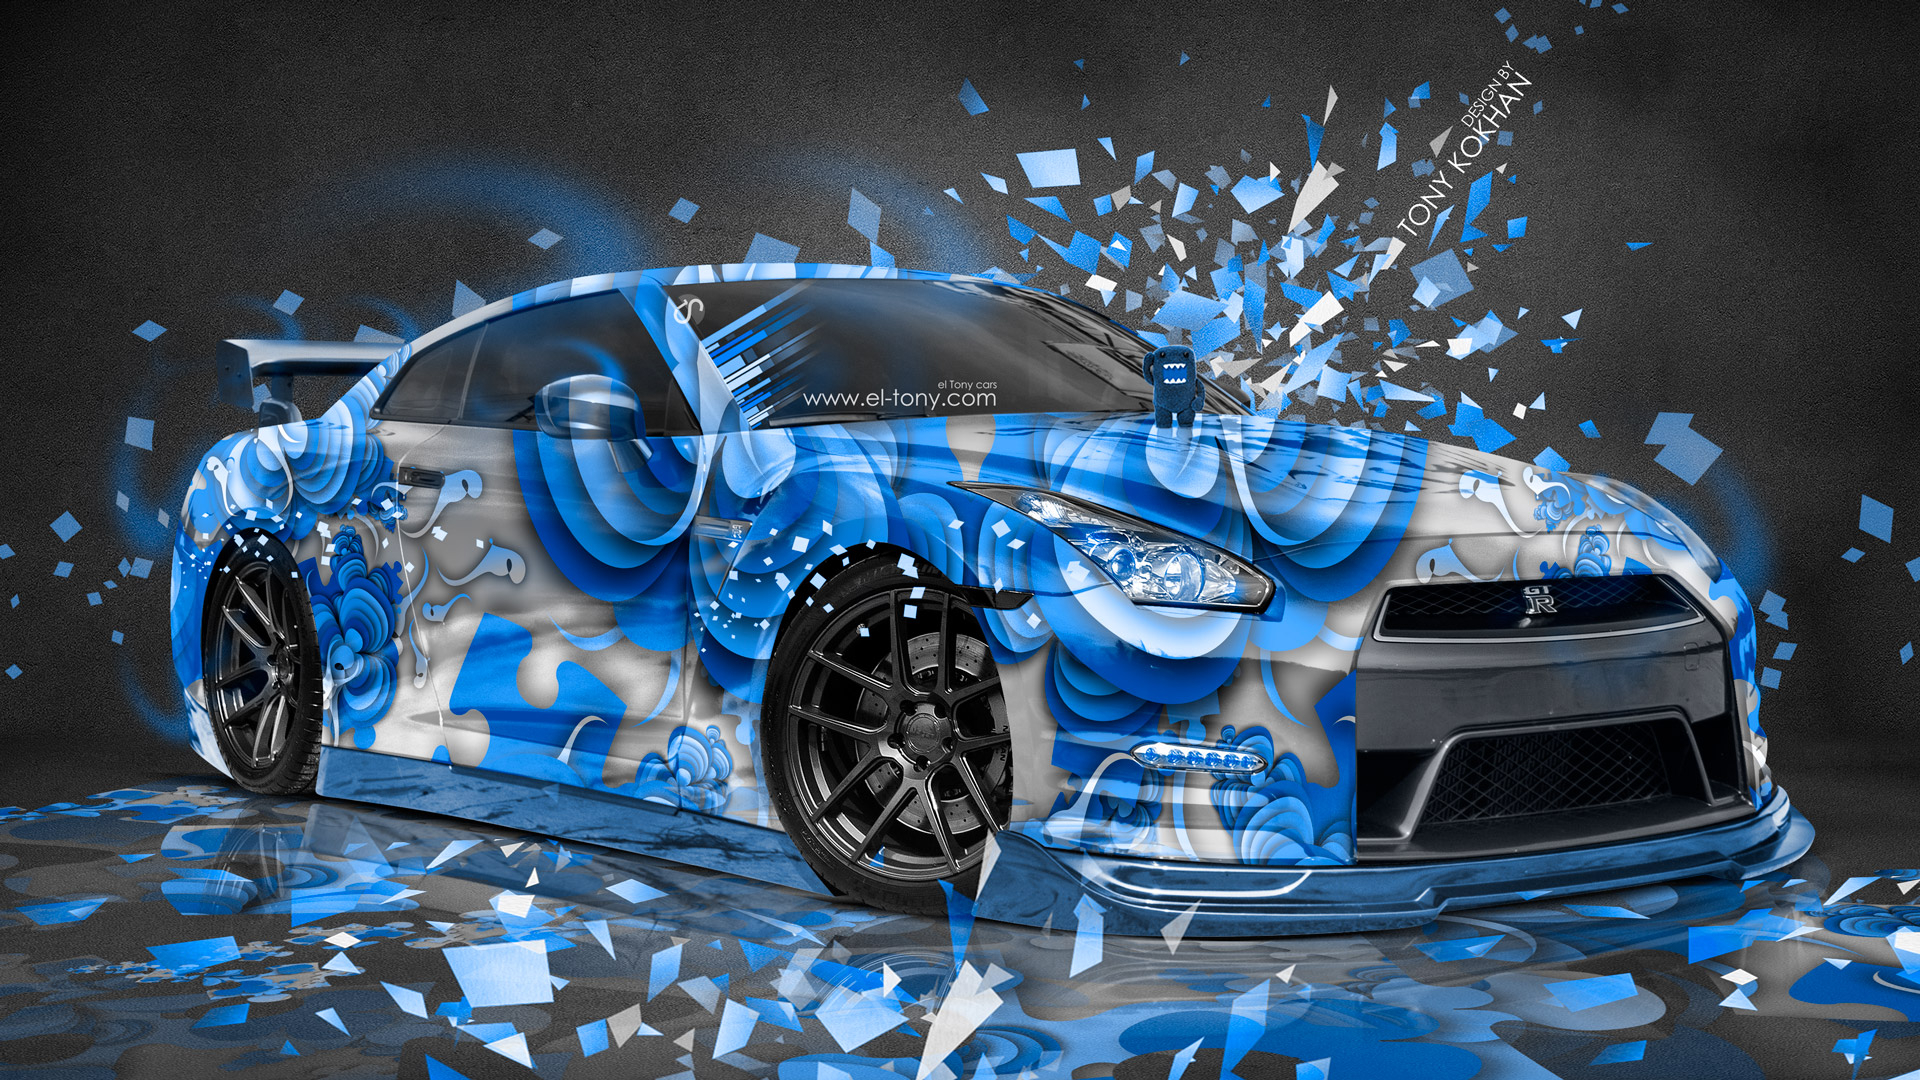 Free Download Nissan Gtr R35 Jdm Style Domo Kun Toy Car 2015 El Tony 1920x1080 For Your Desktop Mobile Tablet Explore 75 3d Wallpapers For Pc 3d Wallpaper For